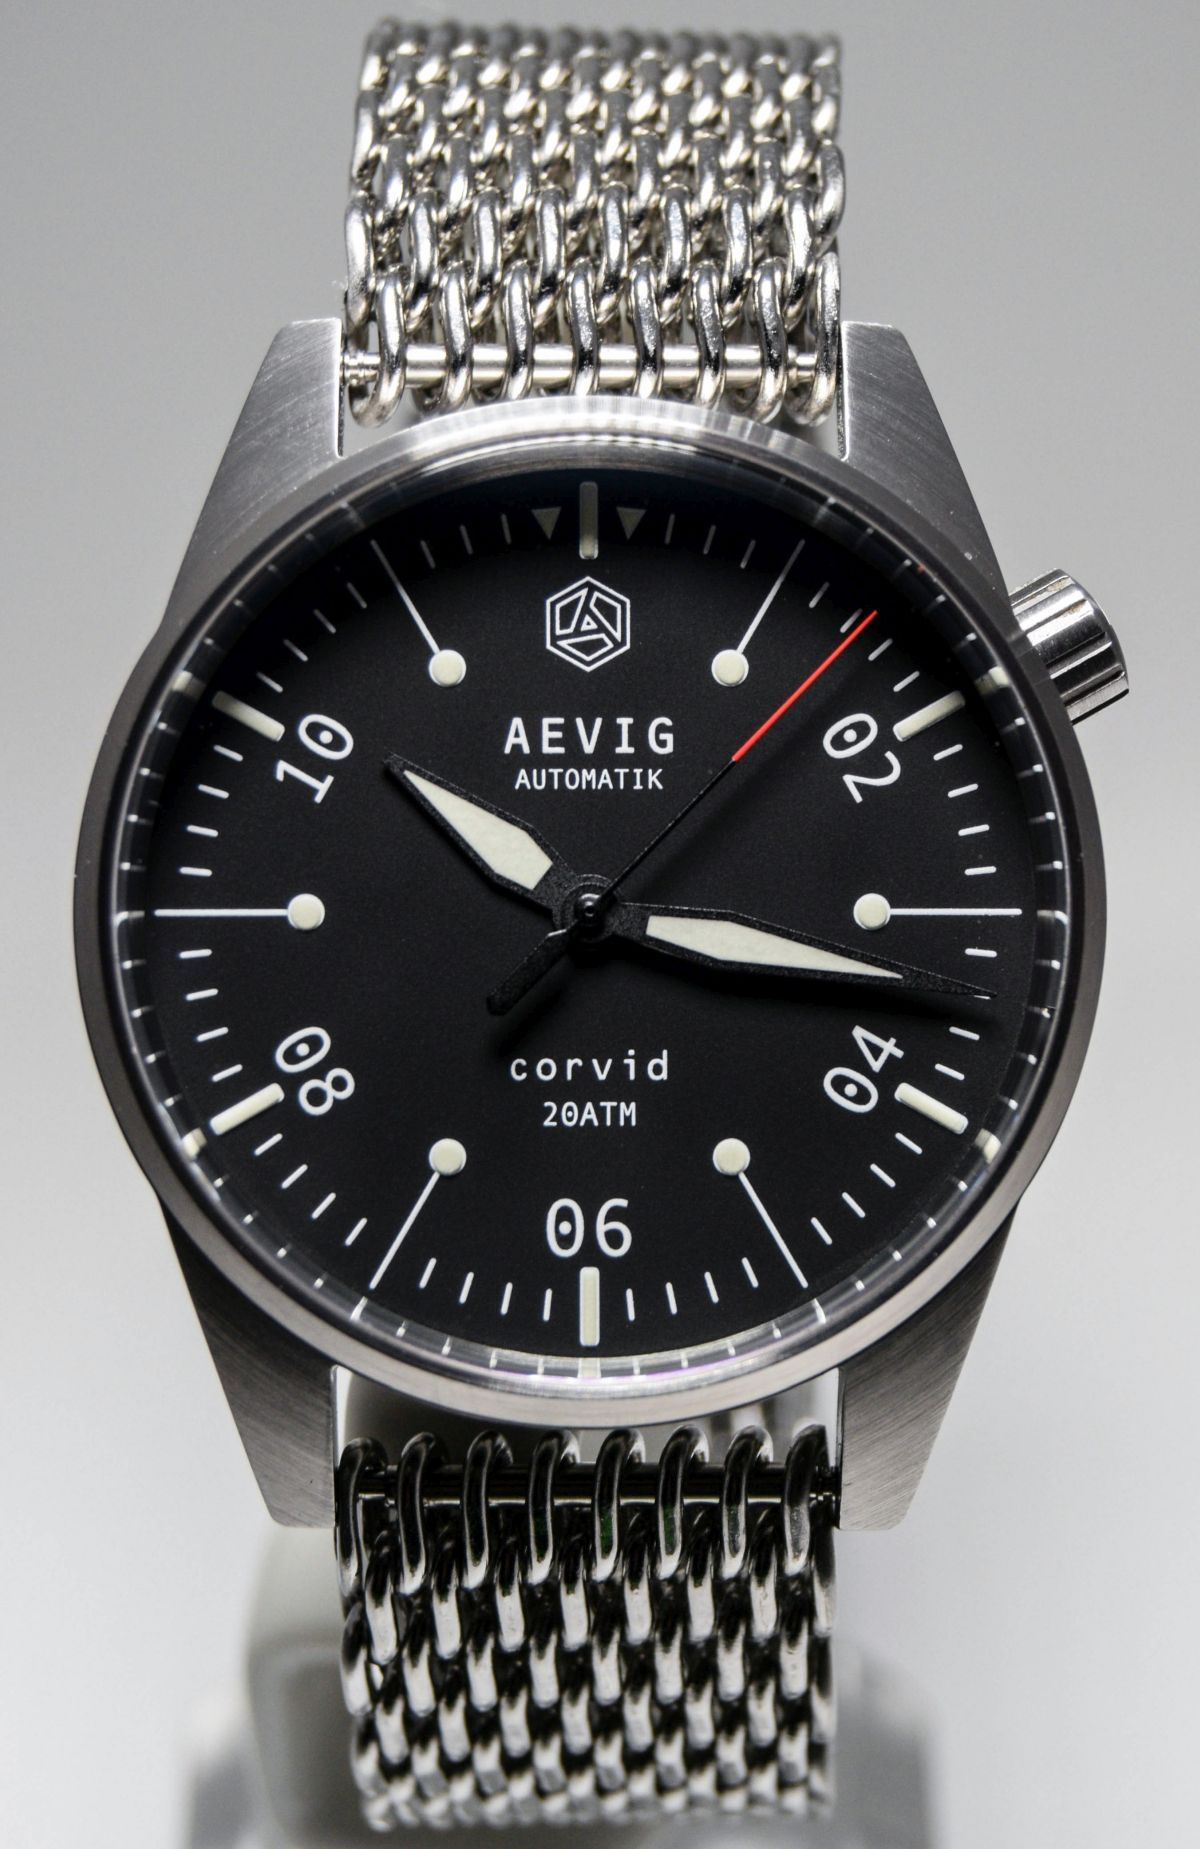 Aevig Corvid Automatic Field Watch Review Rolex, Uhren